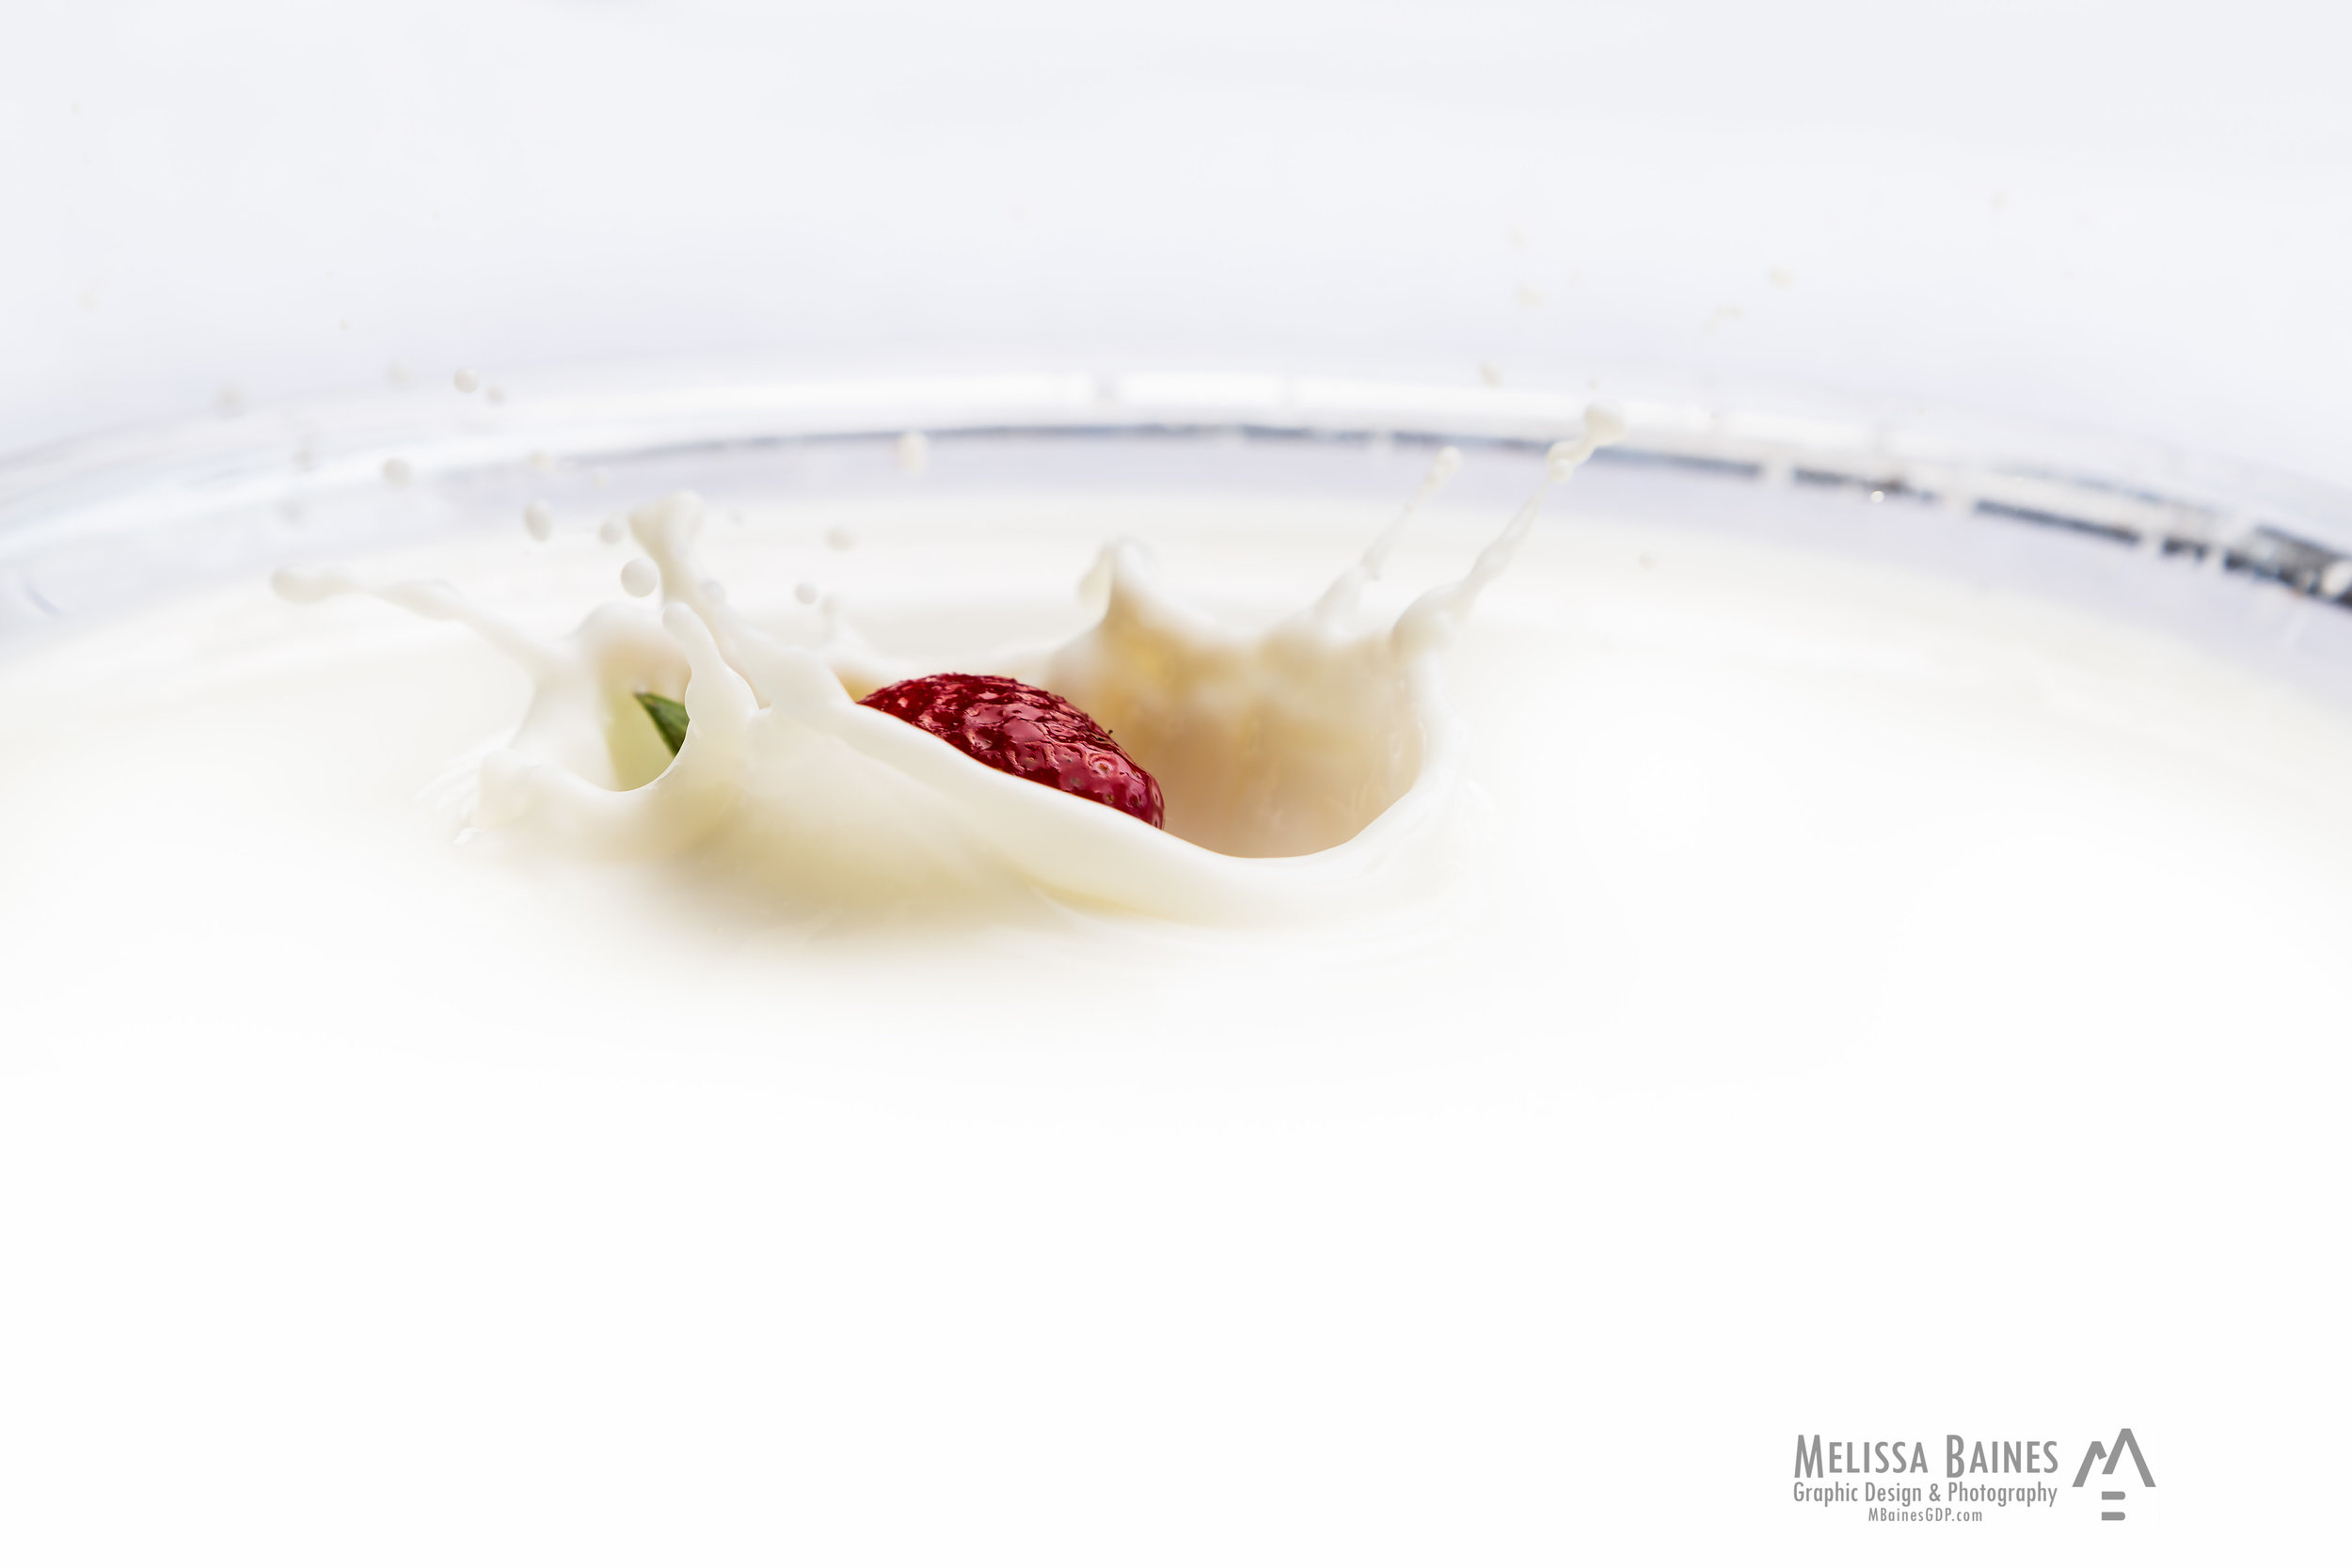 Strawberry in Milk